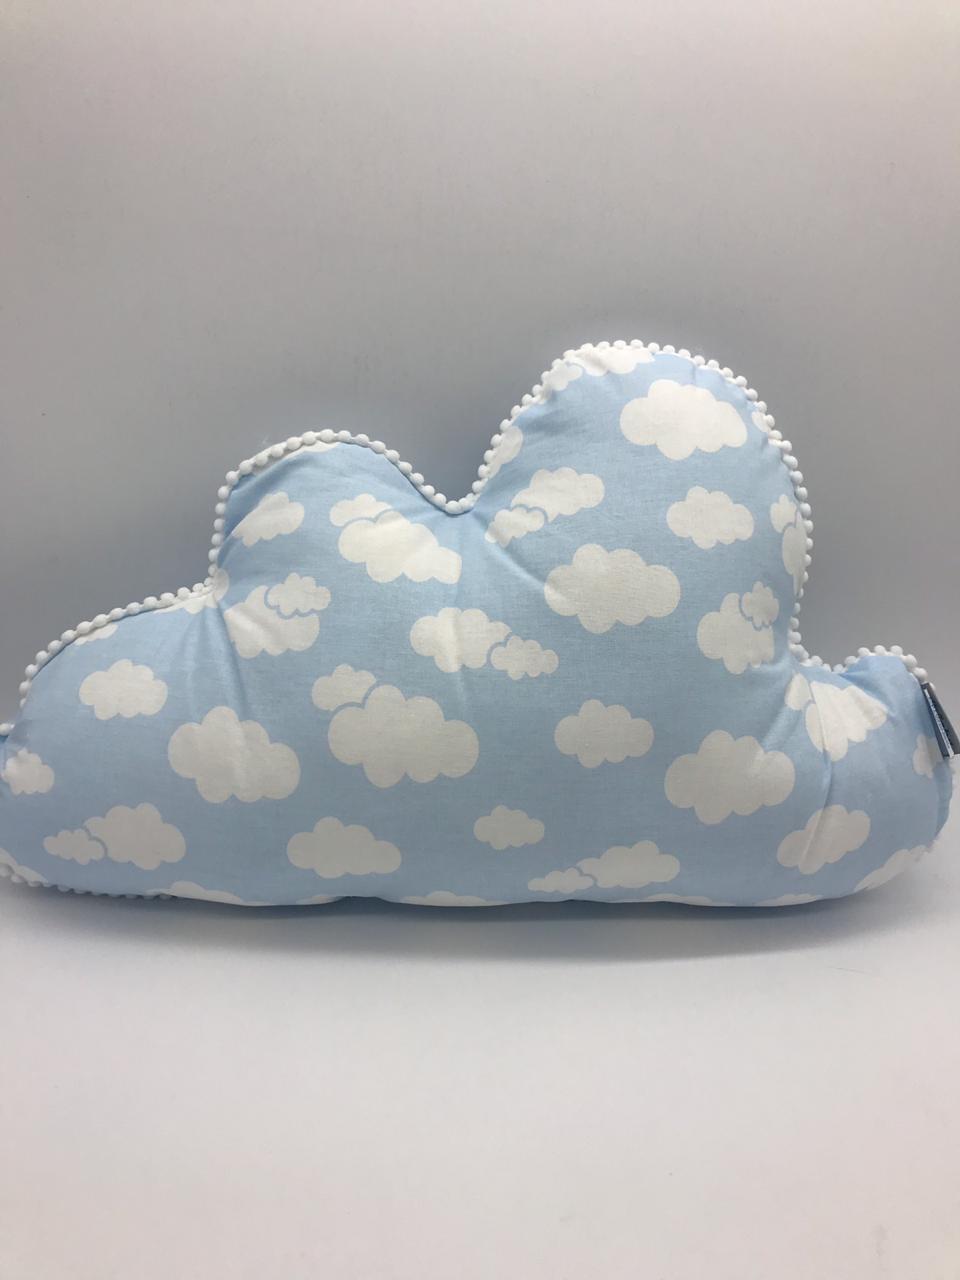 Almofada Nuvem Azul Bebe - Alvinha Minasrey Ref 5843